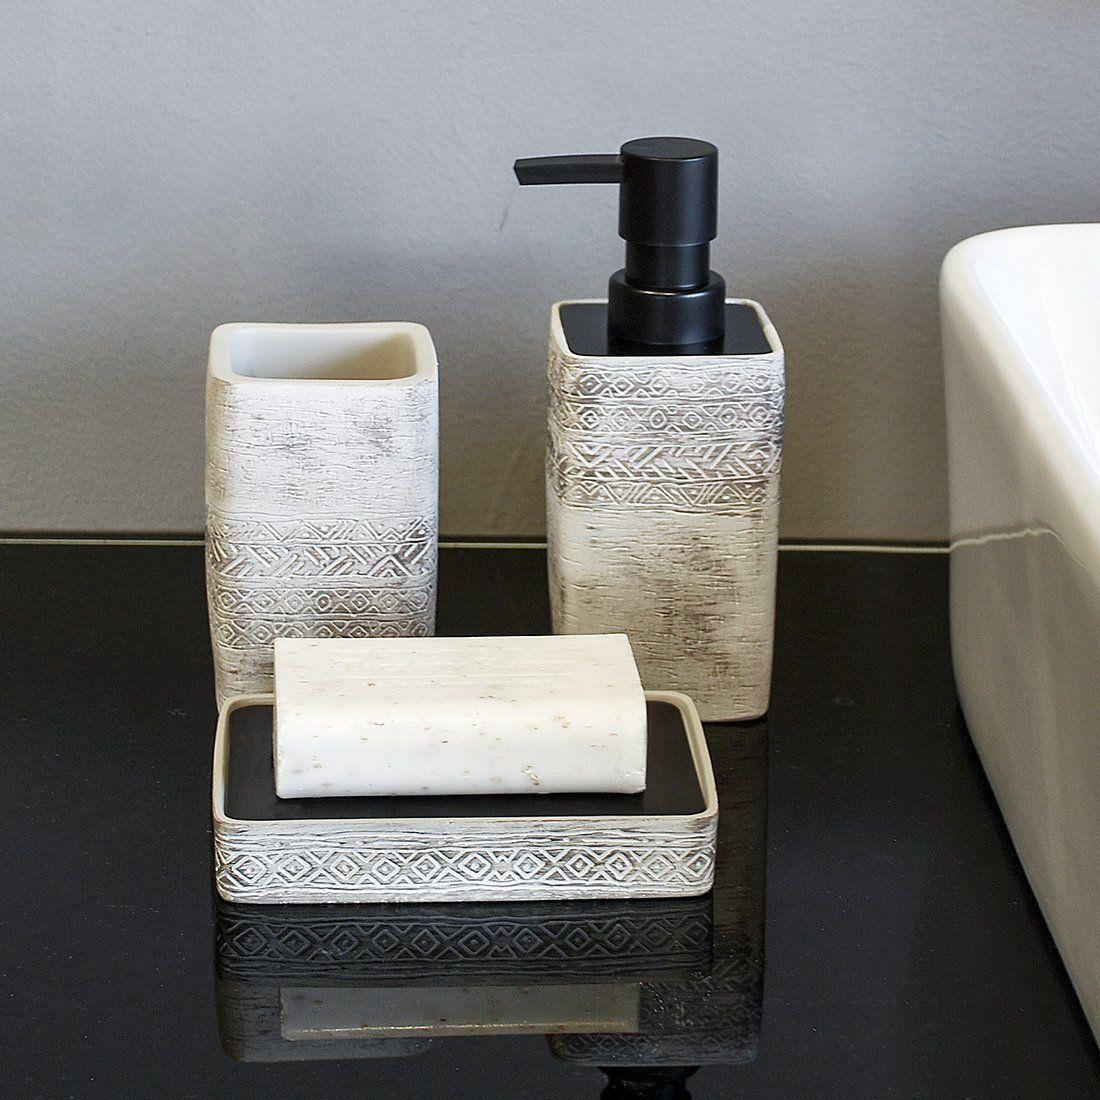 gray bathroom accessories set. SATU BROWN Bathroom Accessories Set 3 Pieces Include Soap Dispenser  Beaker Dish Silver Gray for Kitchen D cor Home Gift Amazon